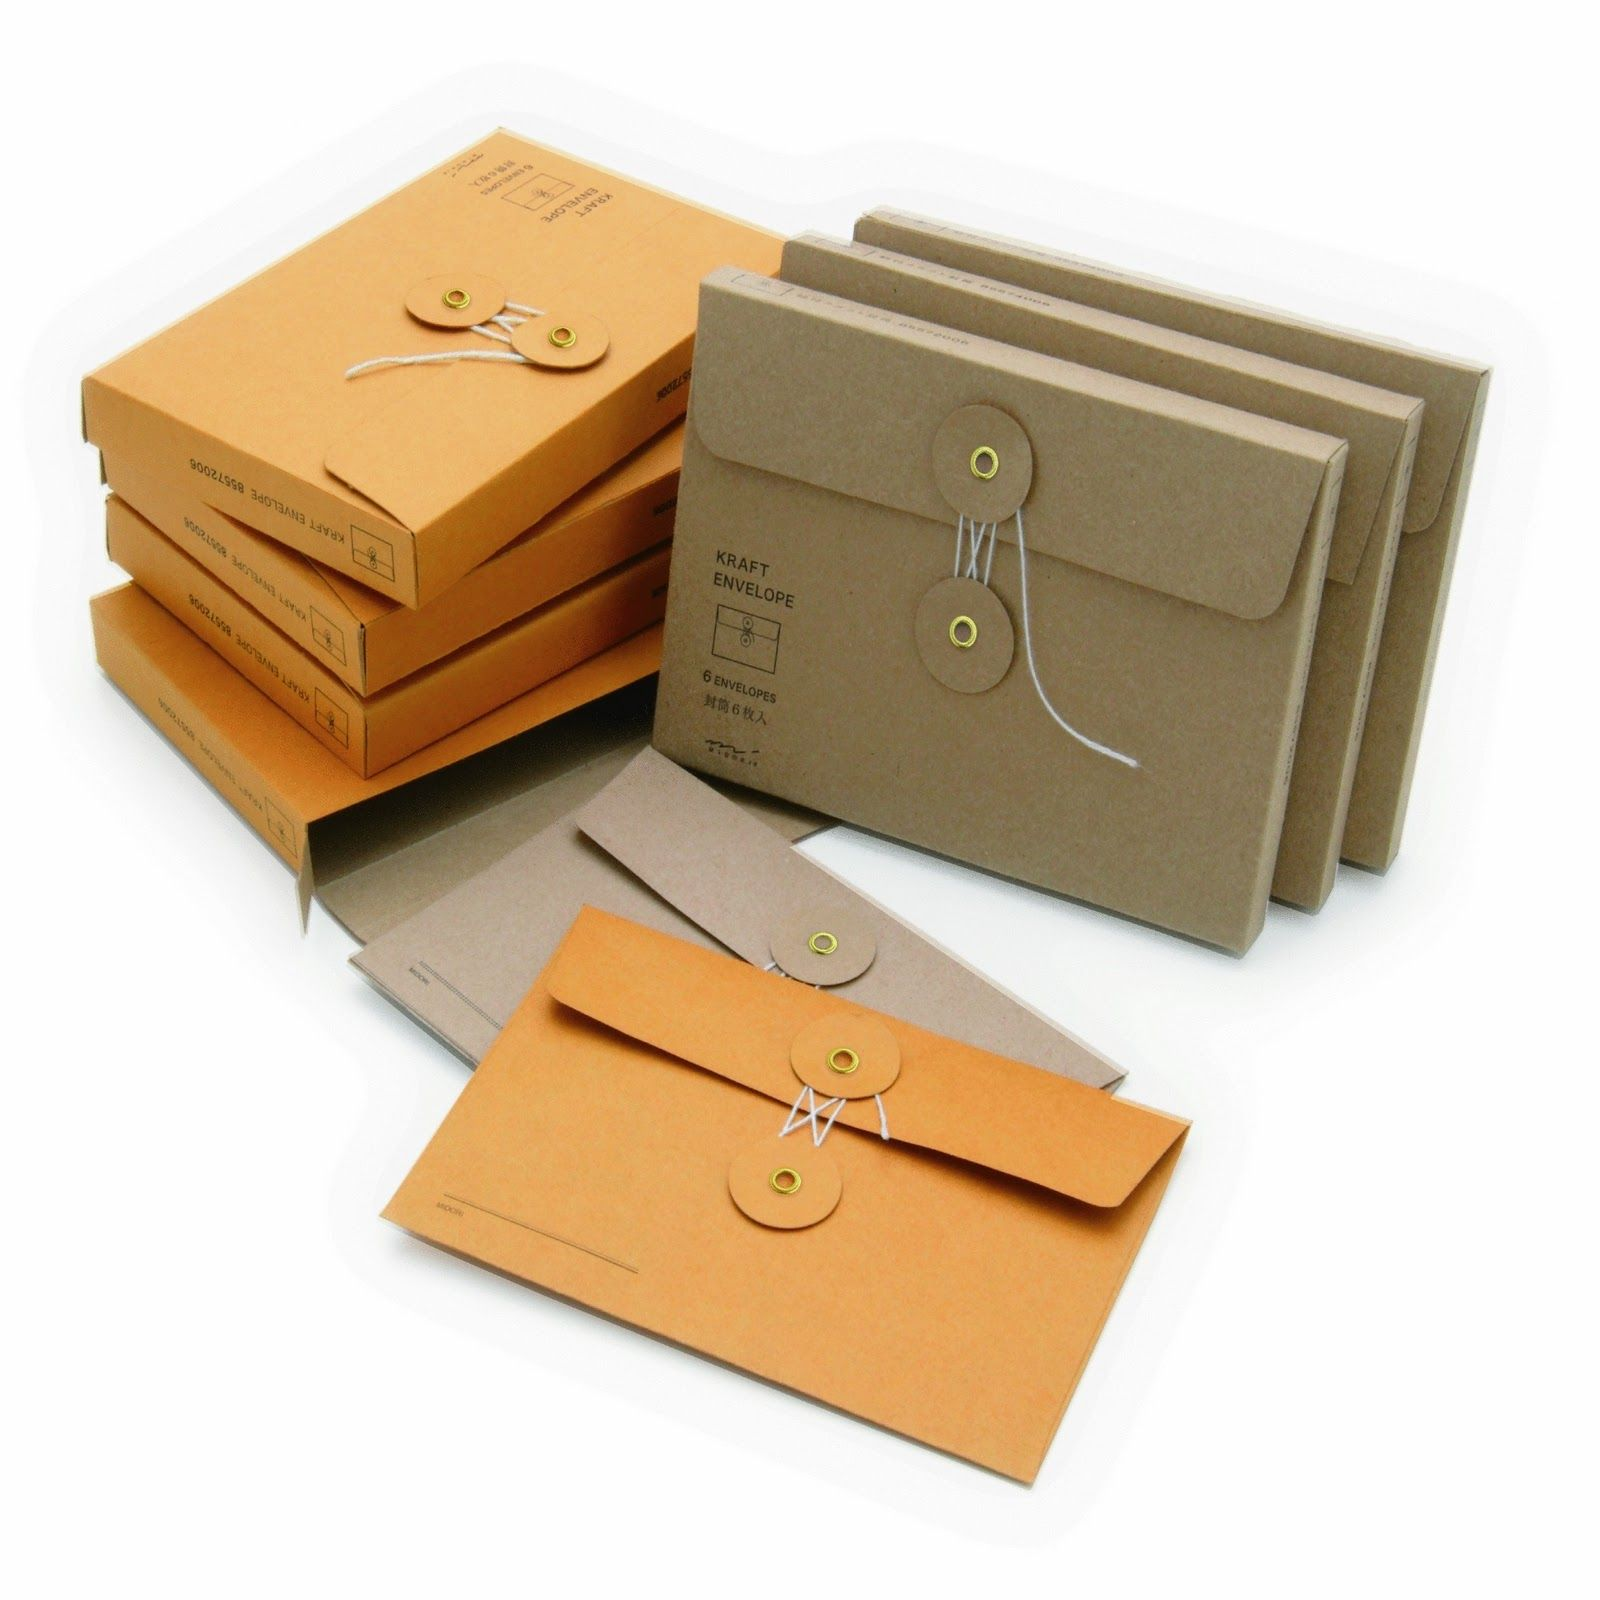 Inspired By Senses Sending A Letter In Style Envelope Packaging